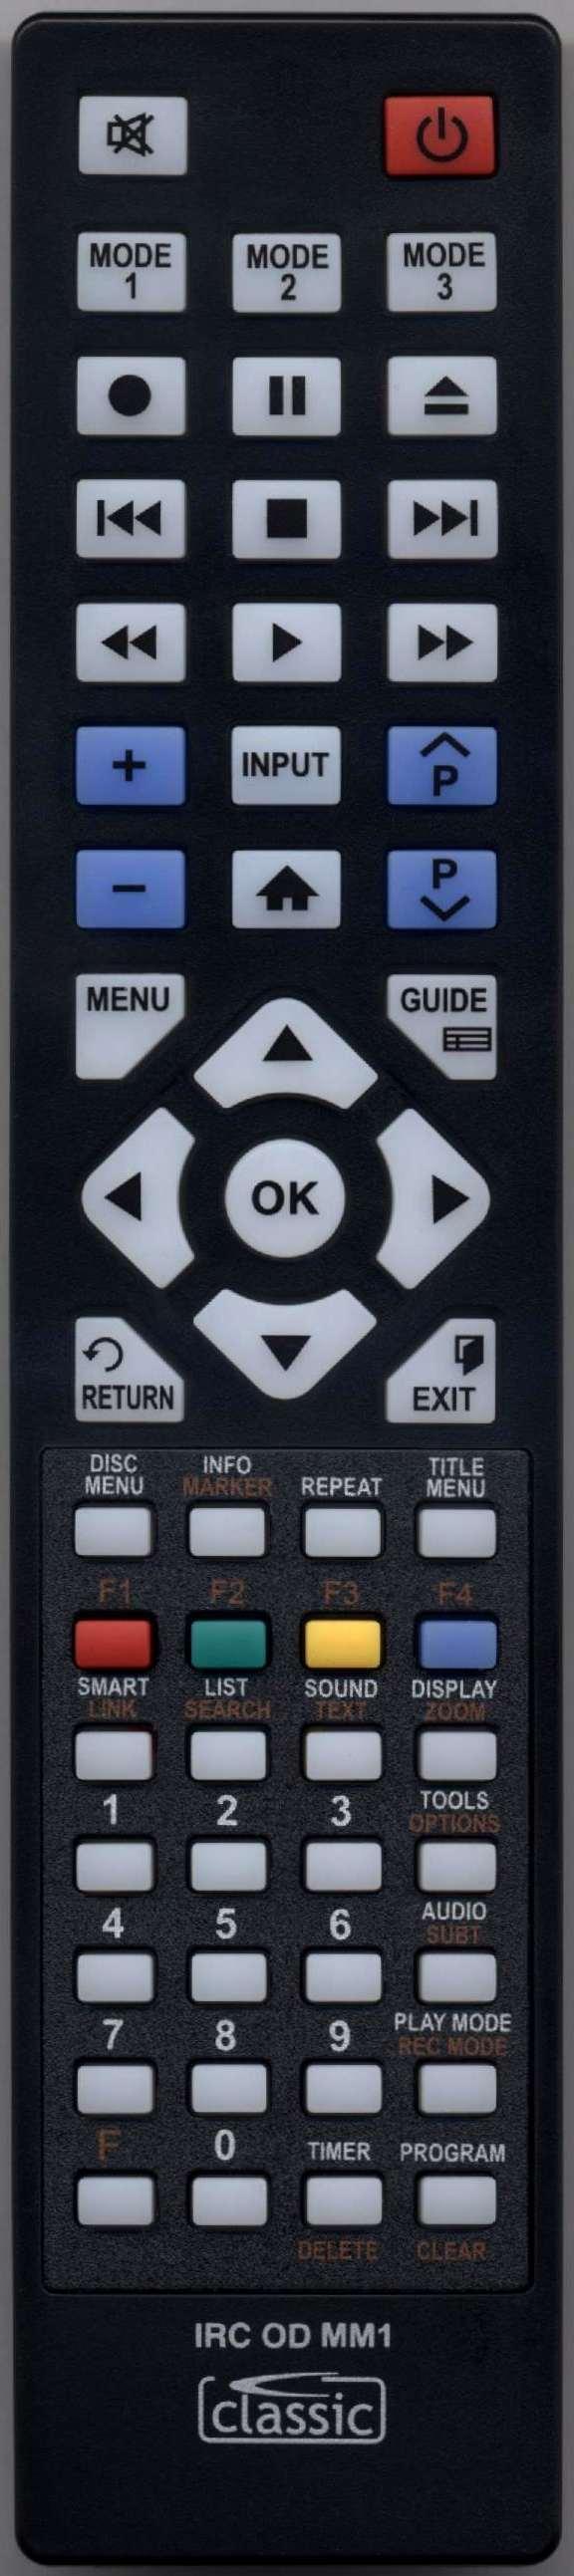 SAMSUNG BDD5500 Remote Control Alternative